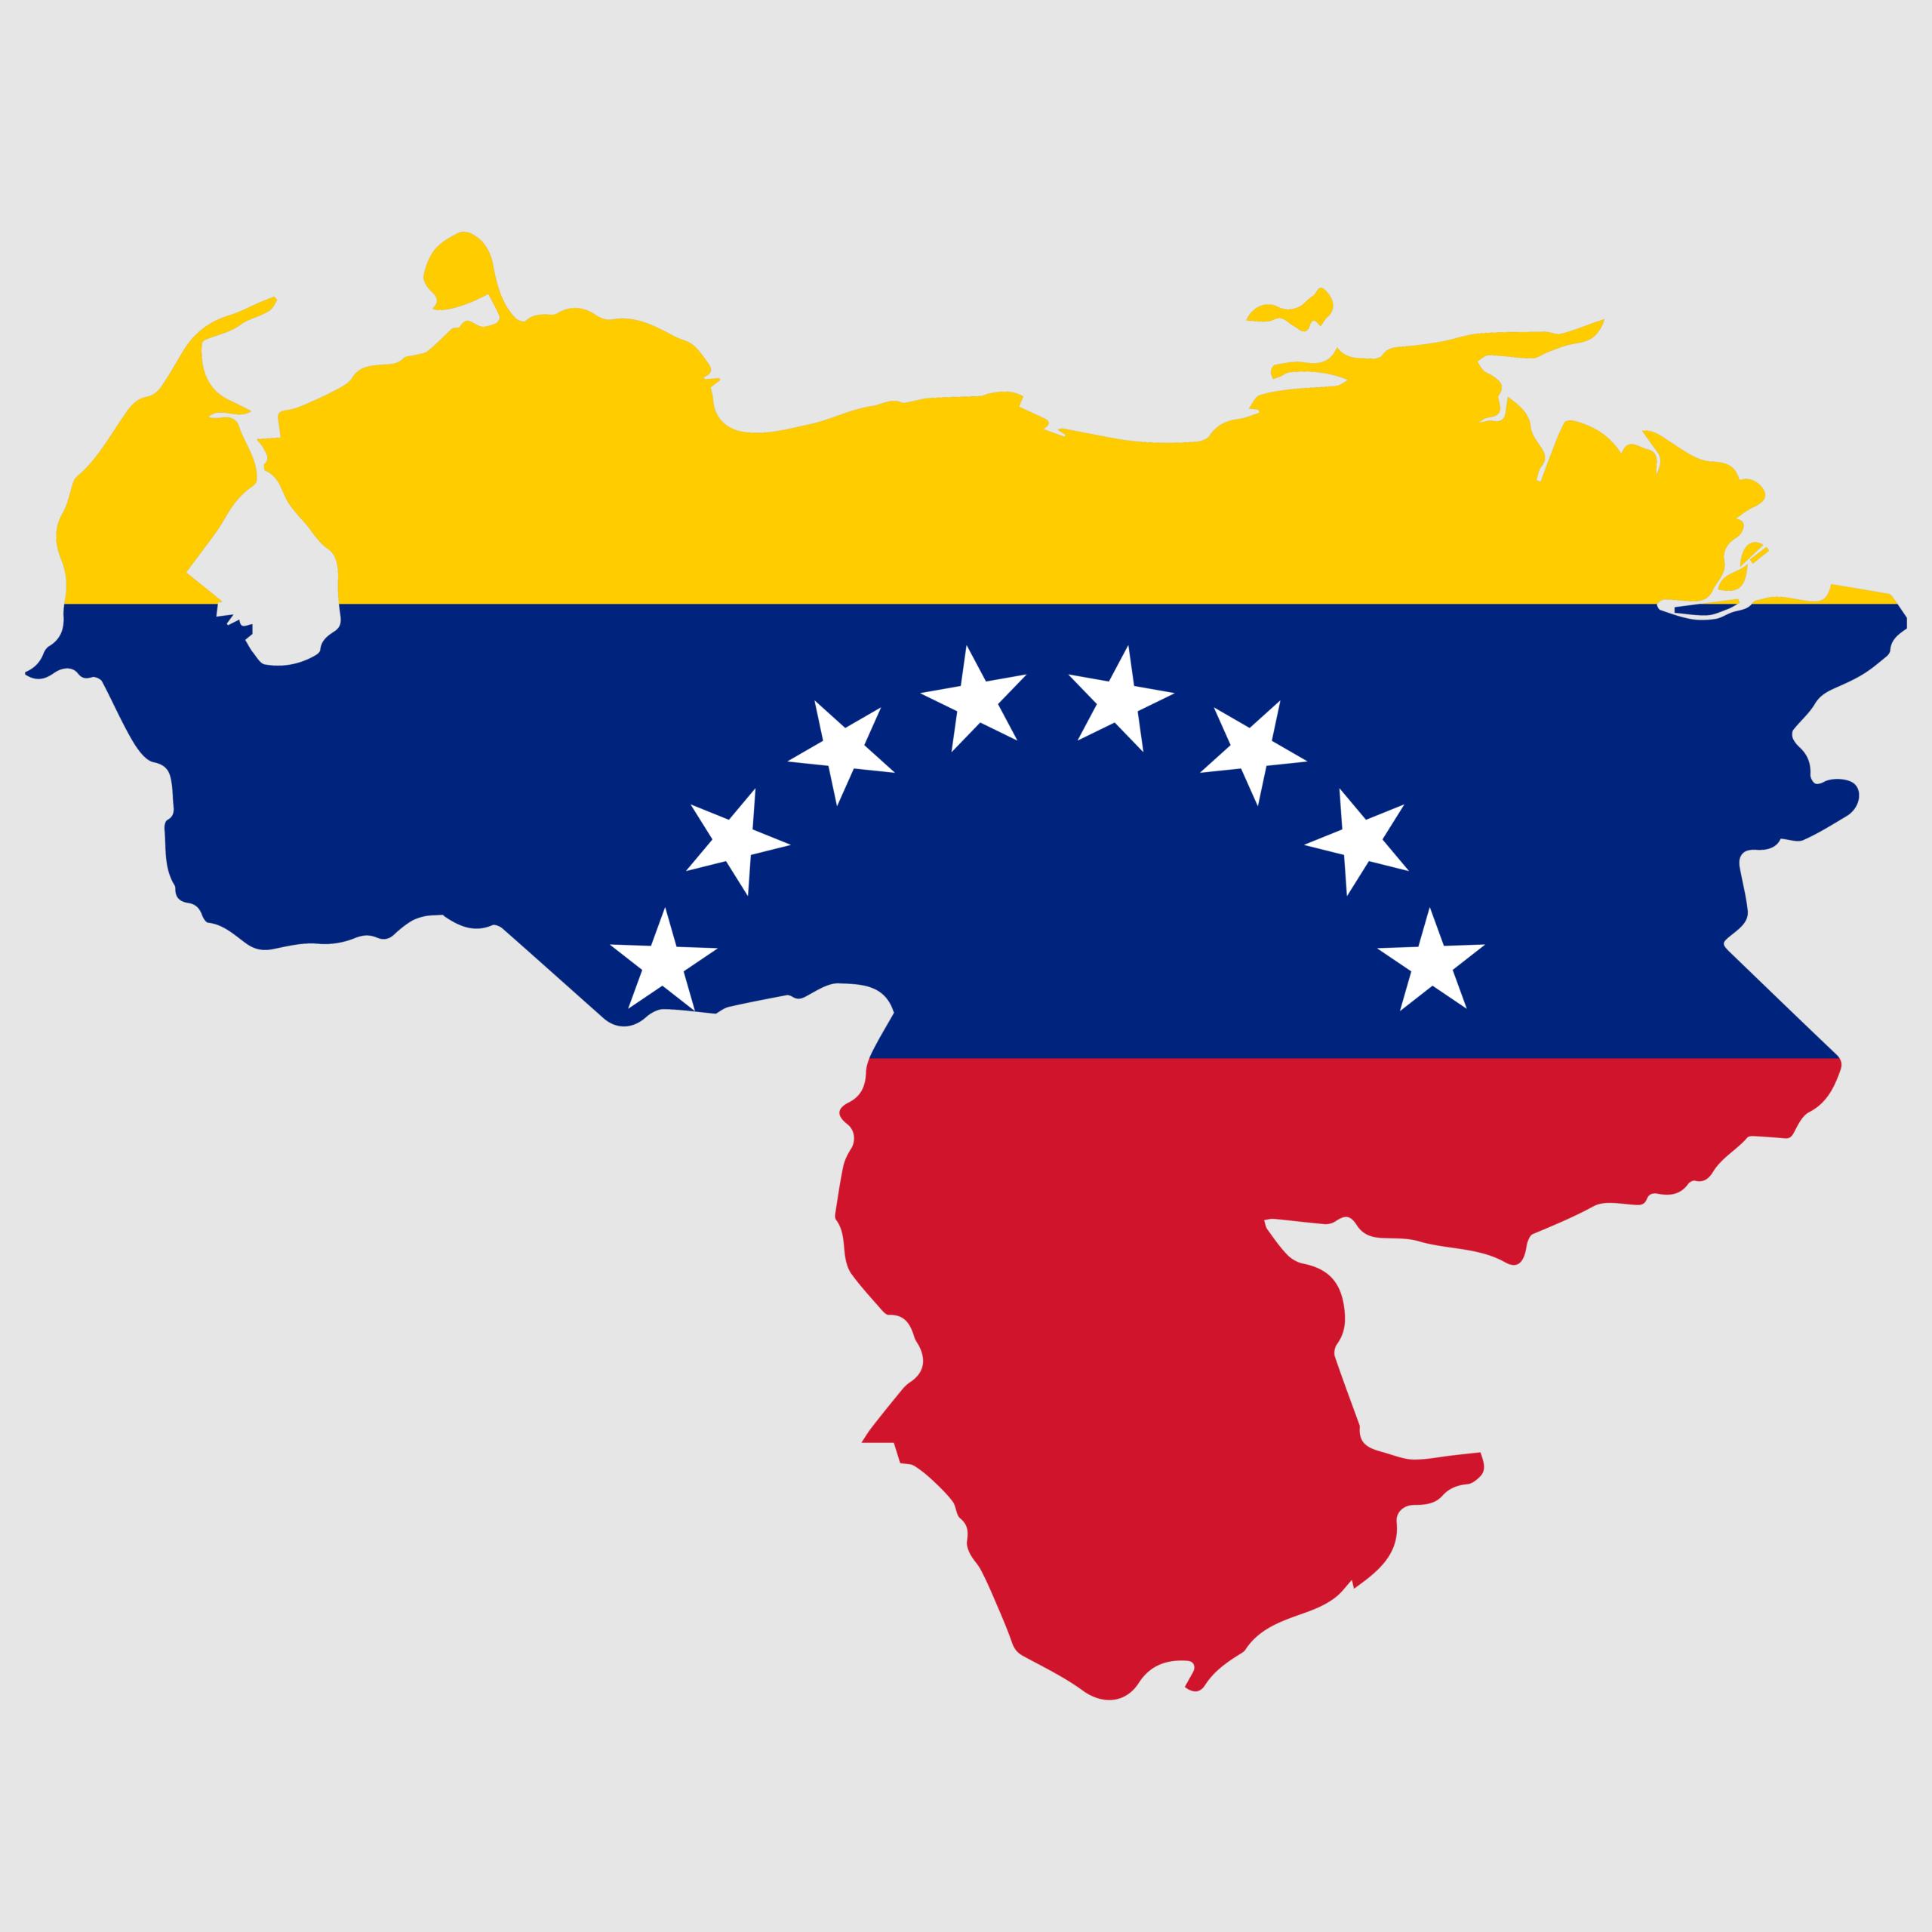 Venezuela Freeman Law